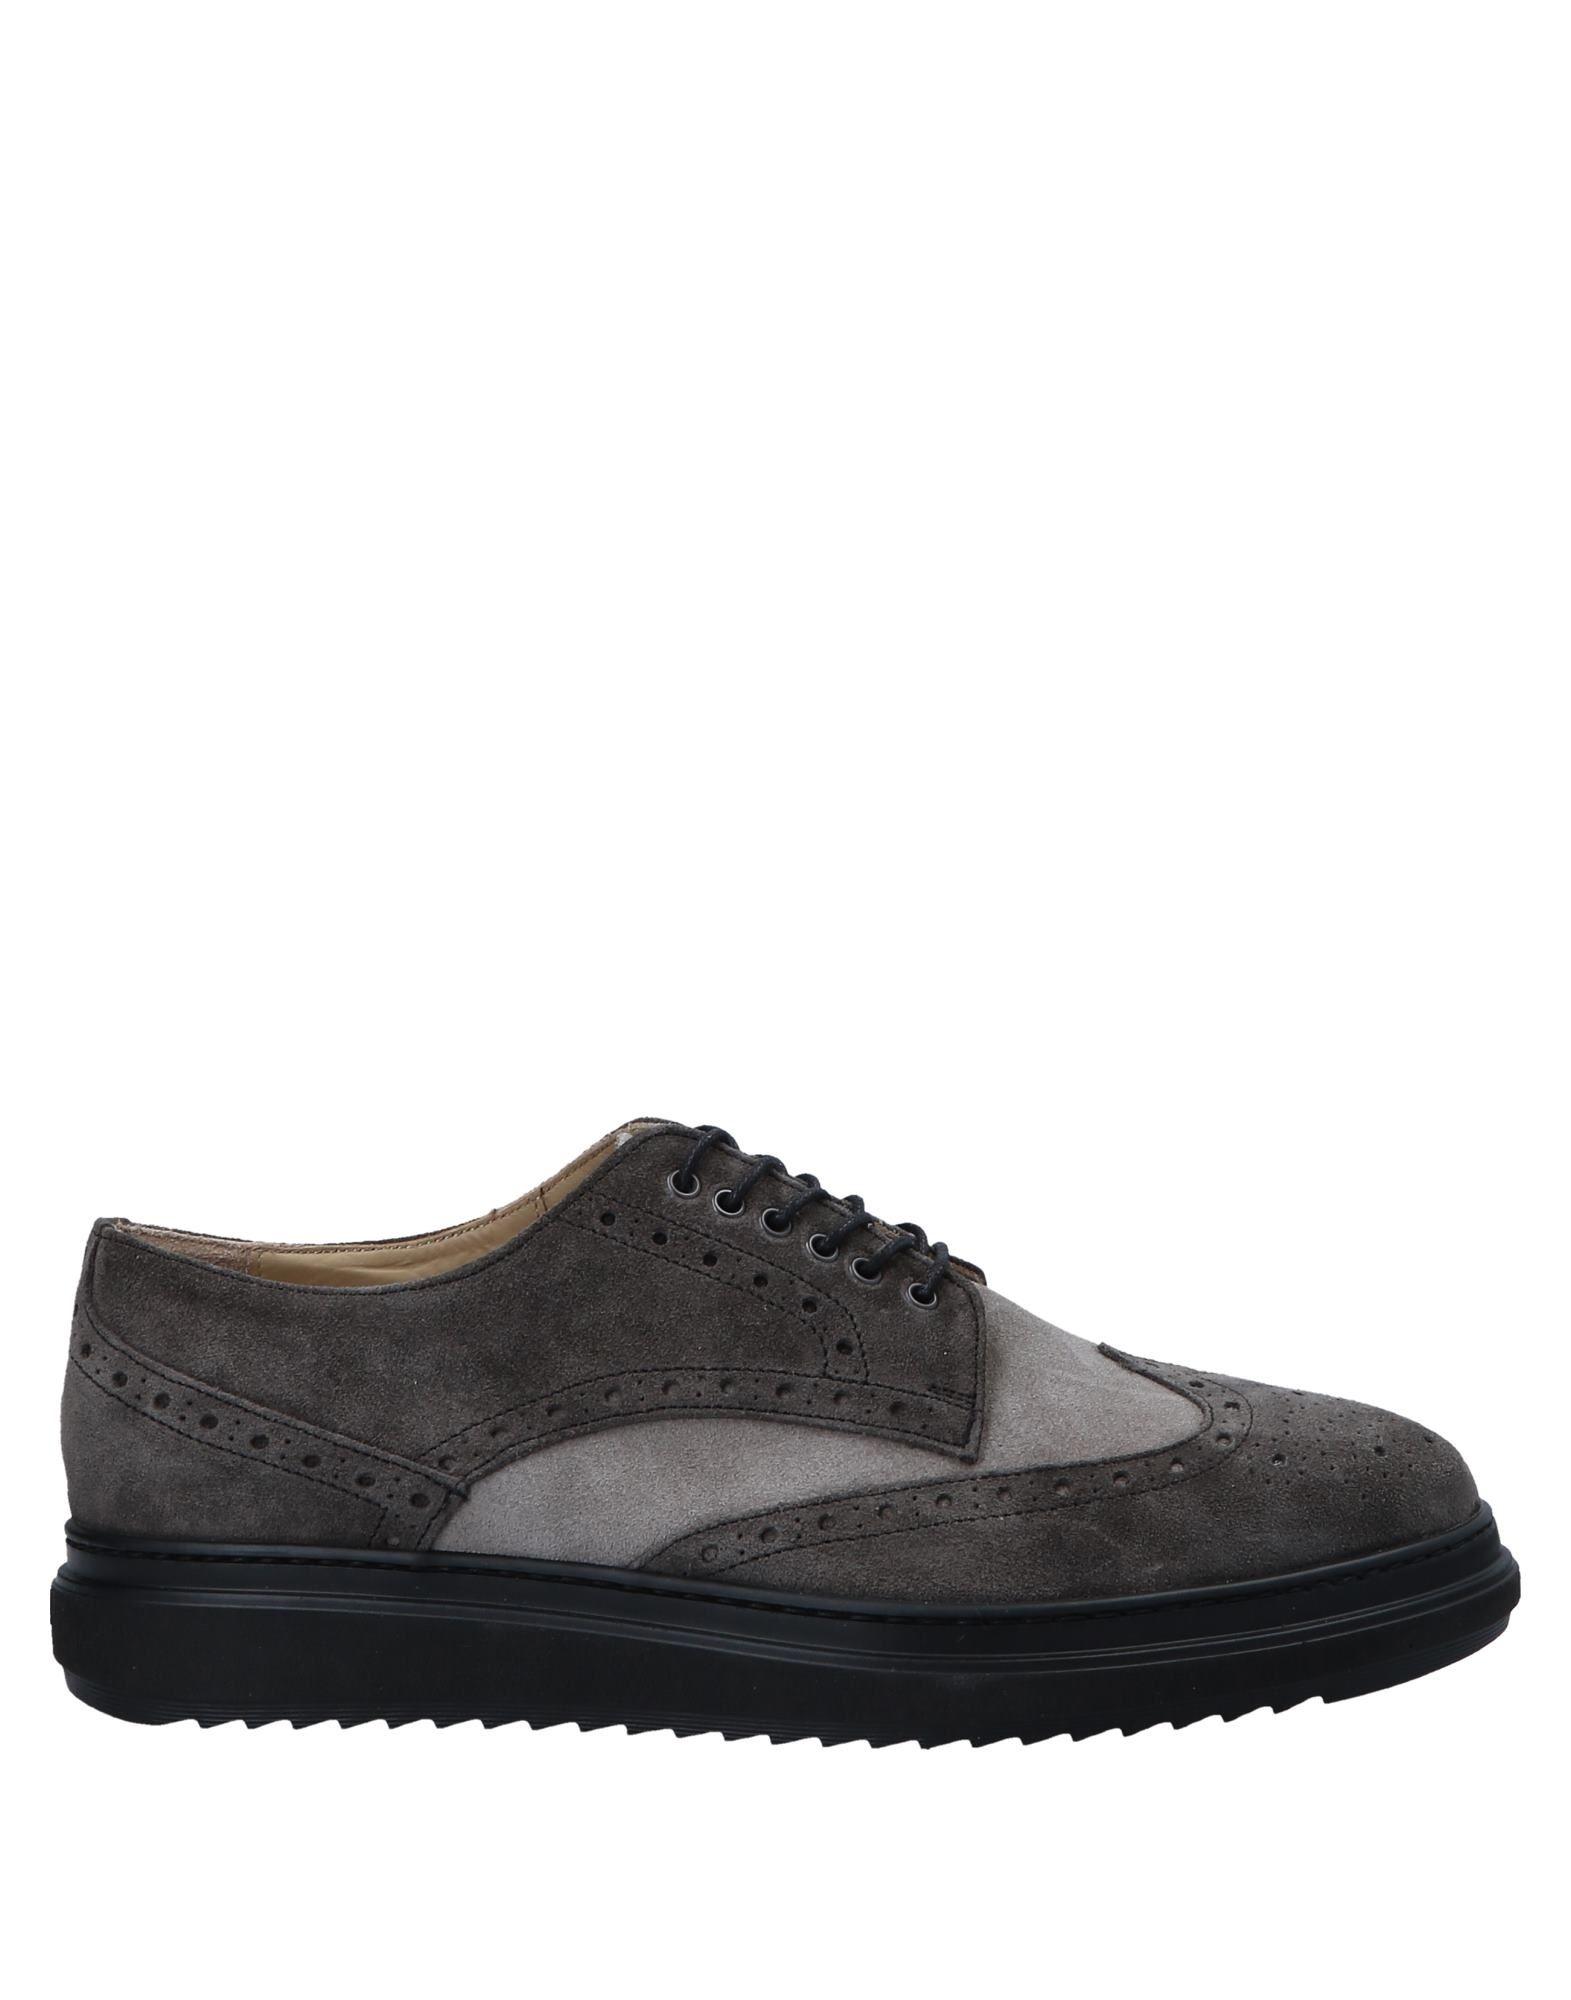 DONATO BOUTIQUE Обувь на шнурках цены онлайн